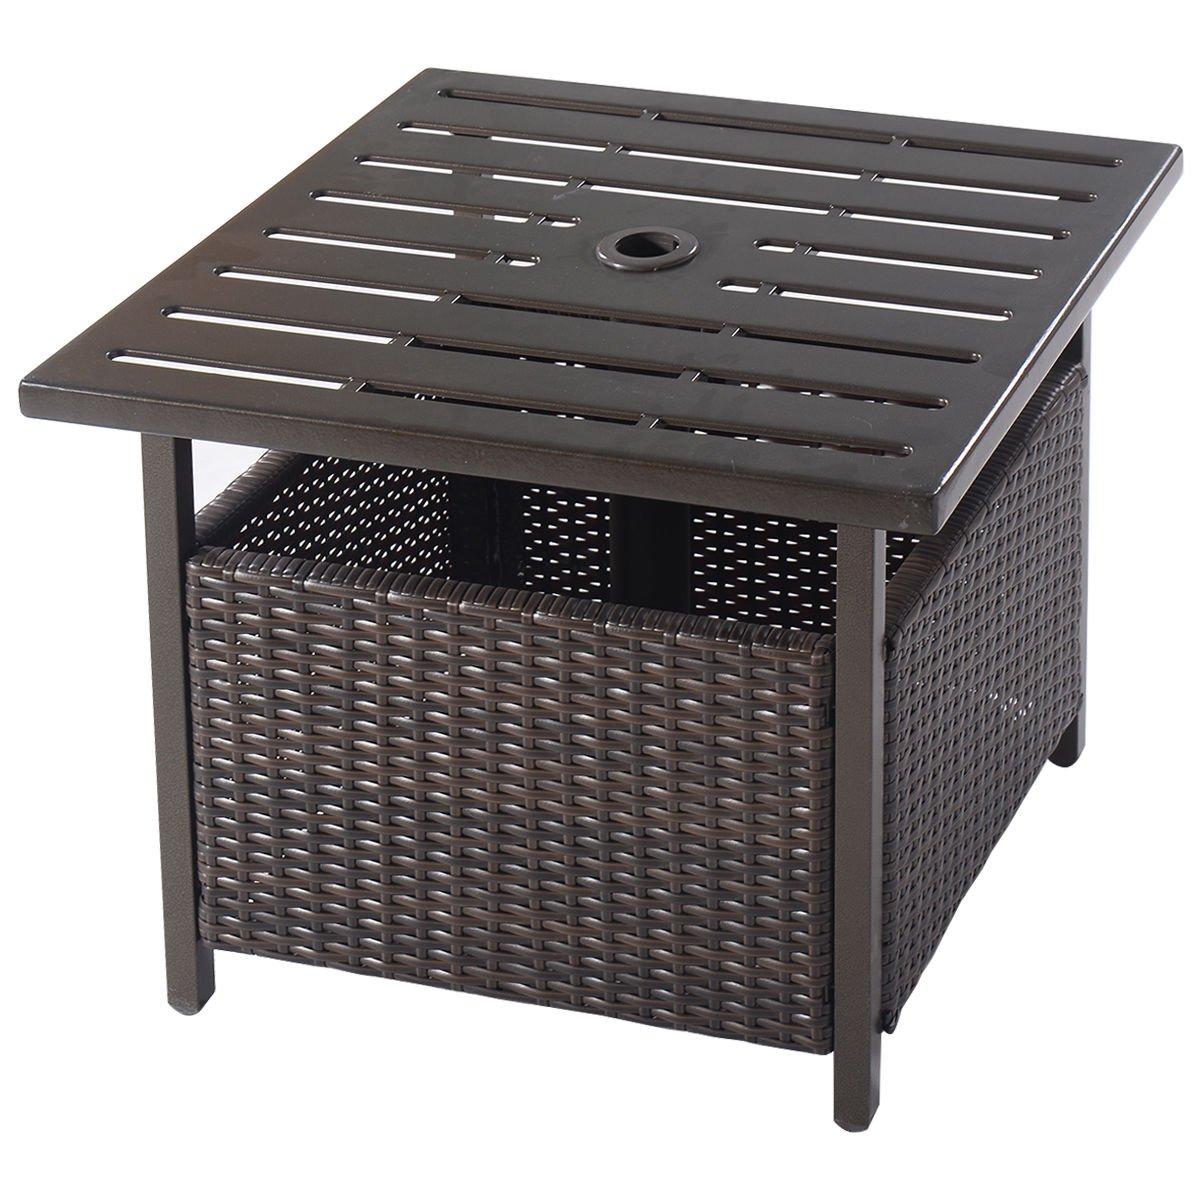 Amazon.com : Giantex Brown Rattan Wicker Umbrella Stand Steel Side Table  Outdoor Furniture Deck Garden Patio Pool : Patio, Lawn U0026 Garden